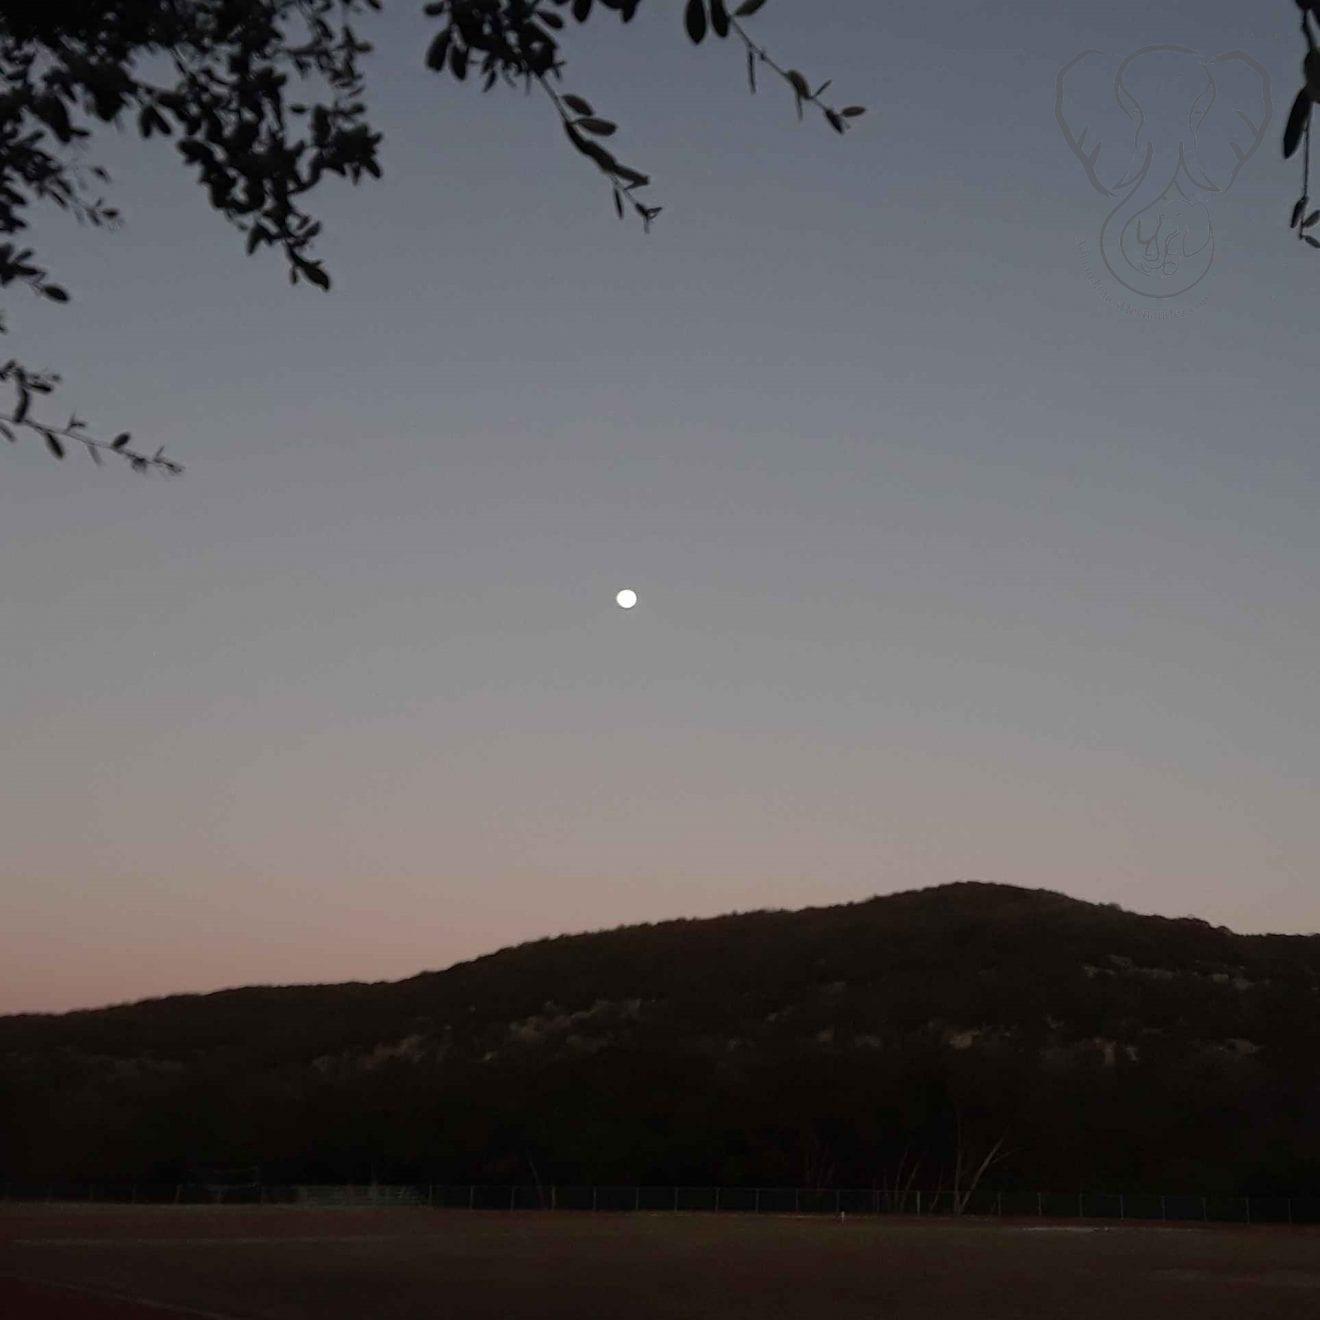 Full moon in Texas (Miranda Hernandez)